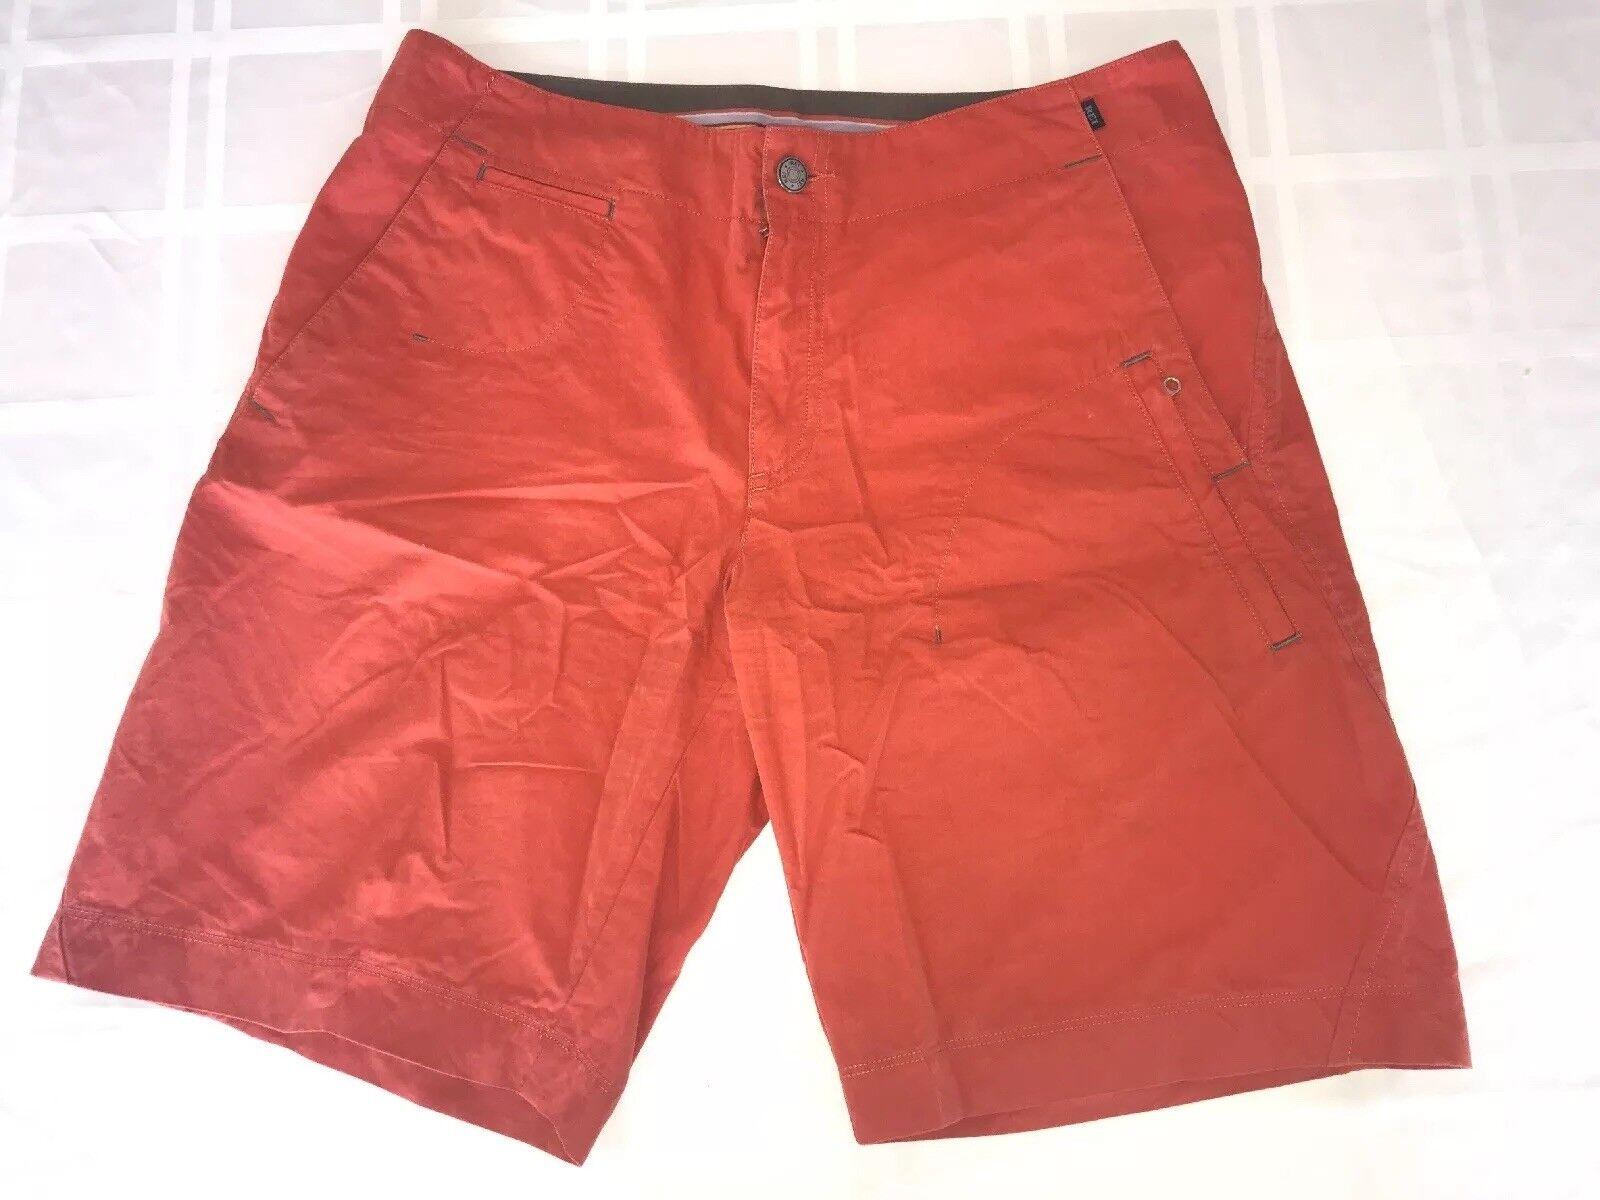 REI Hiking Casual Shorts Cotton Nylon Blend Women's Size 10 orange TS8